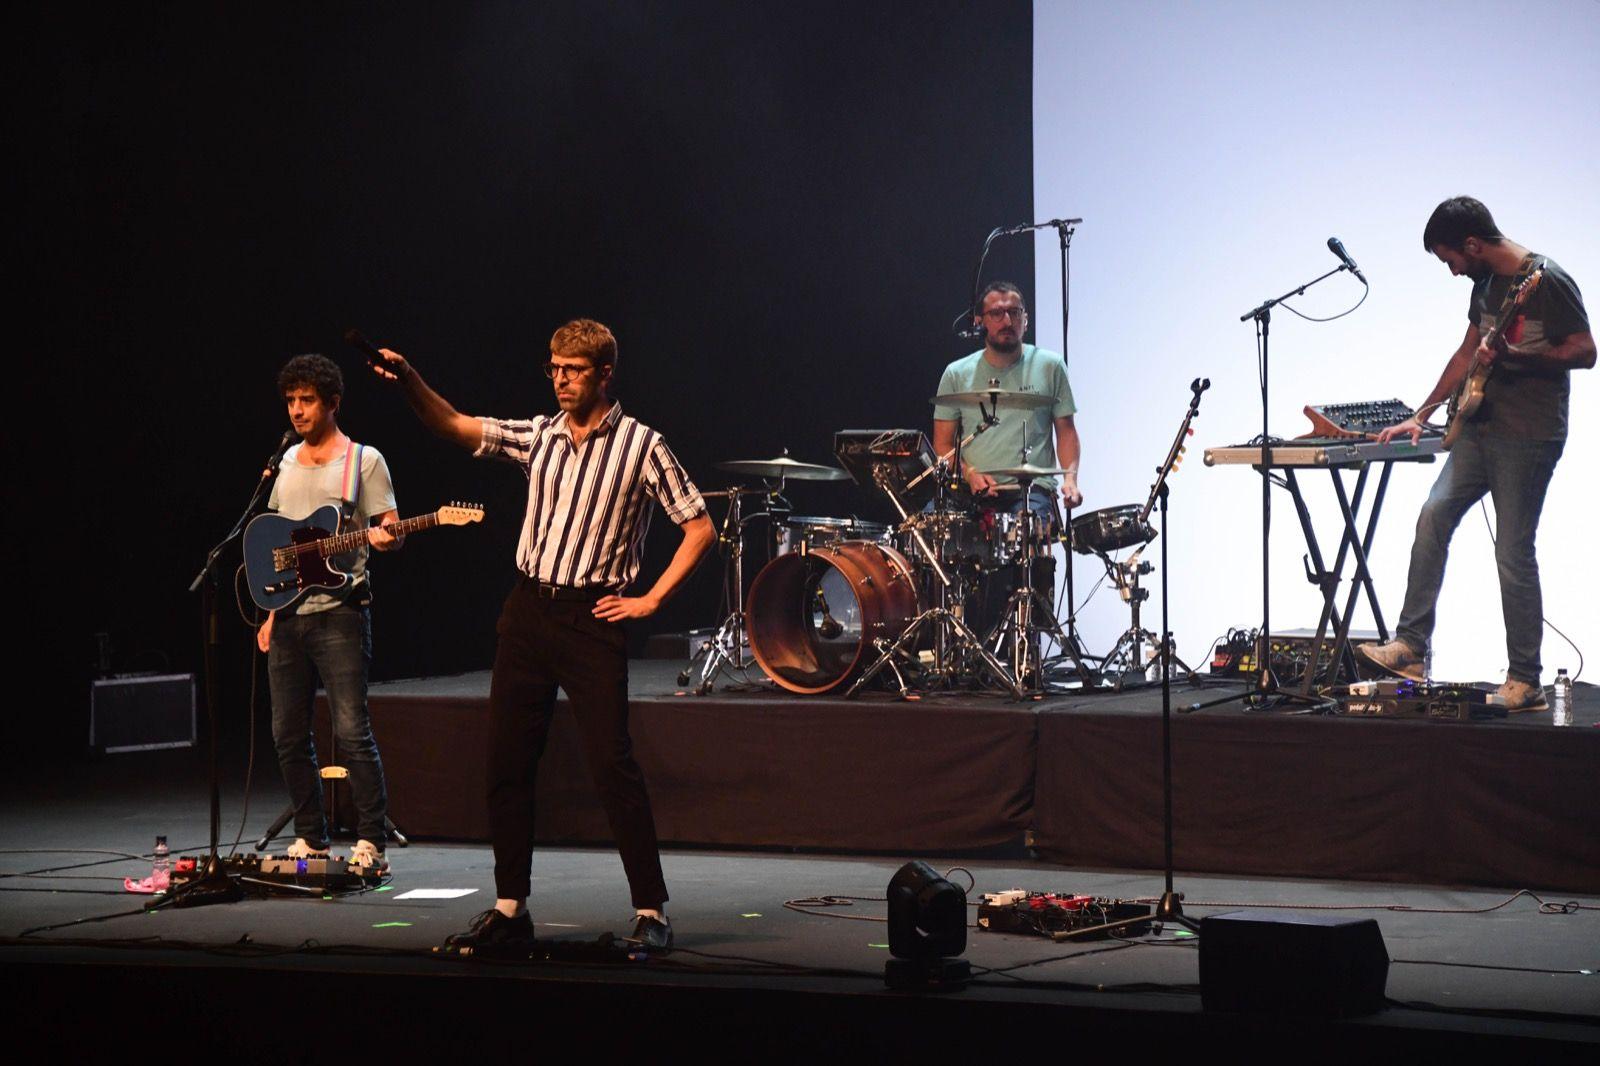 Manel al festival Petits Camaleons. Foto: Jordi Garcia